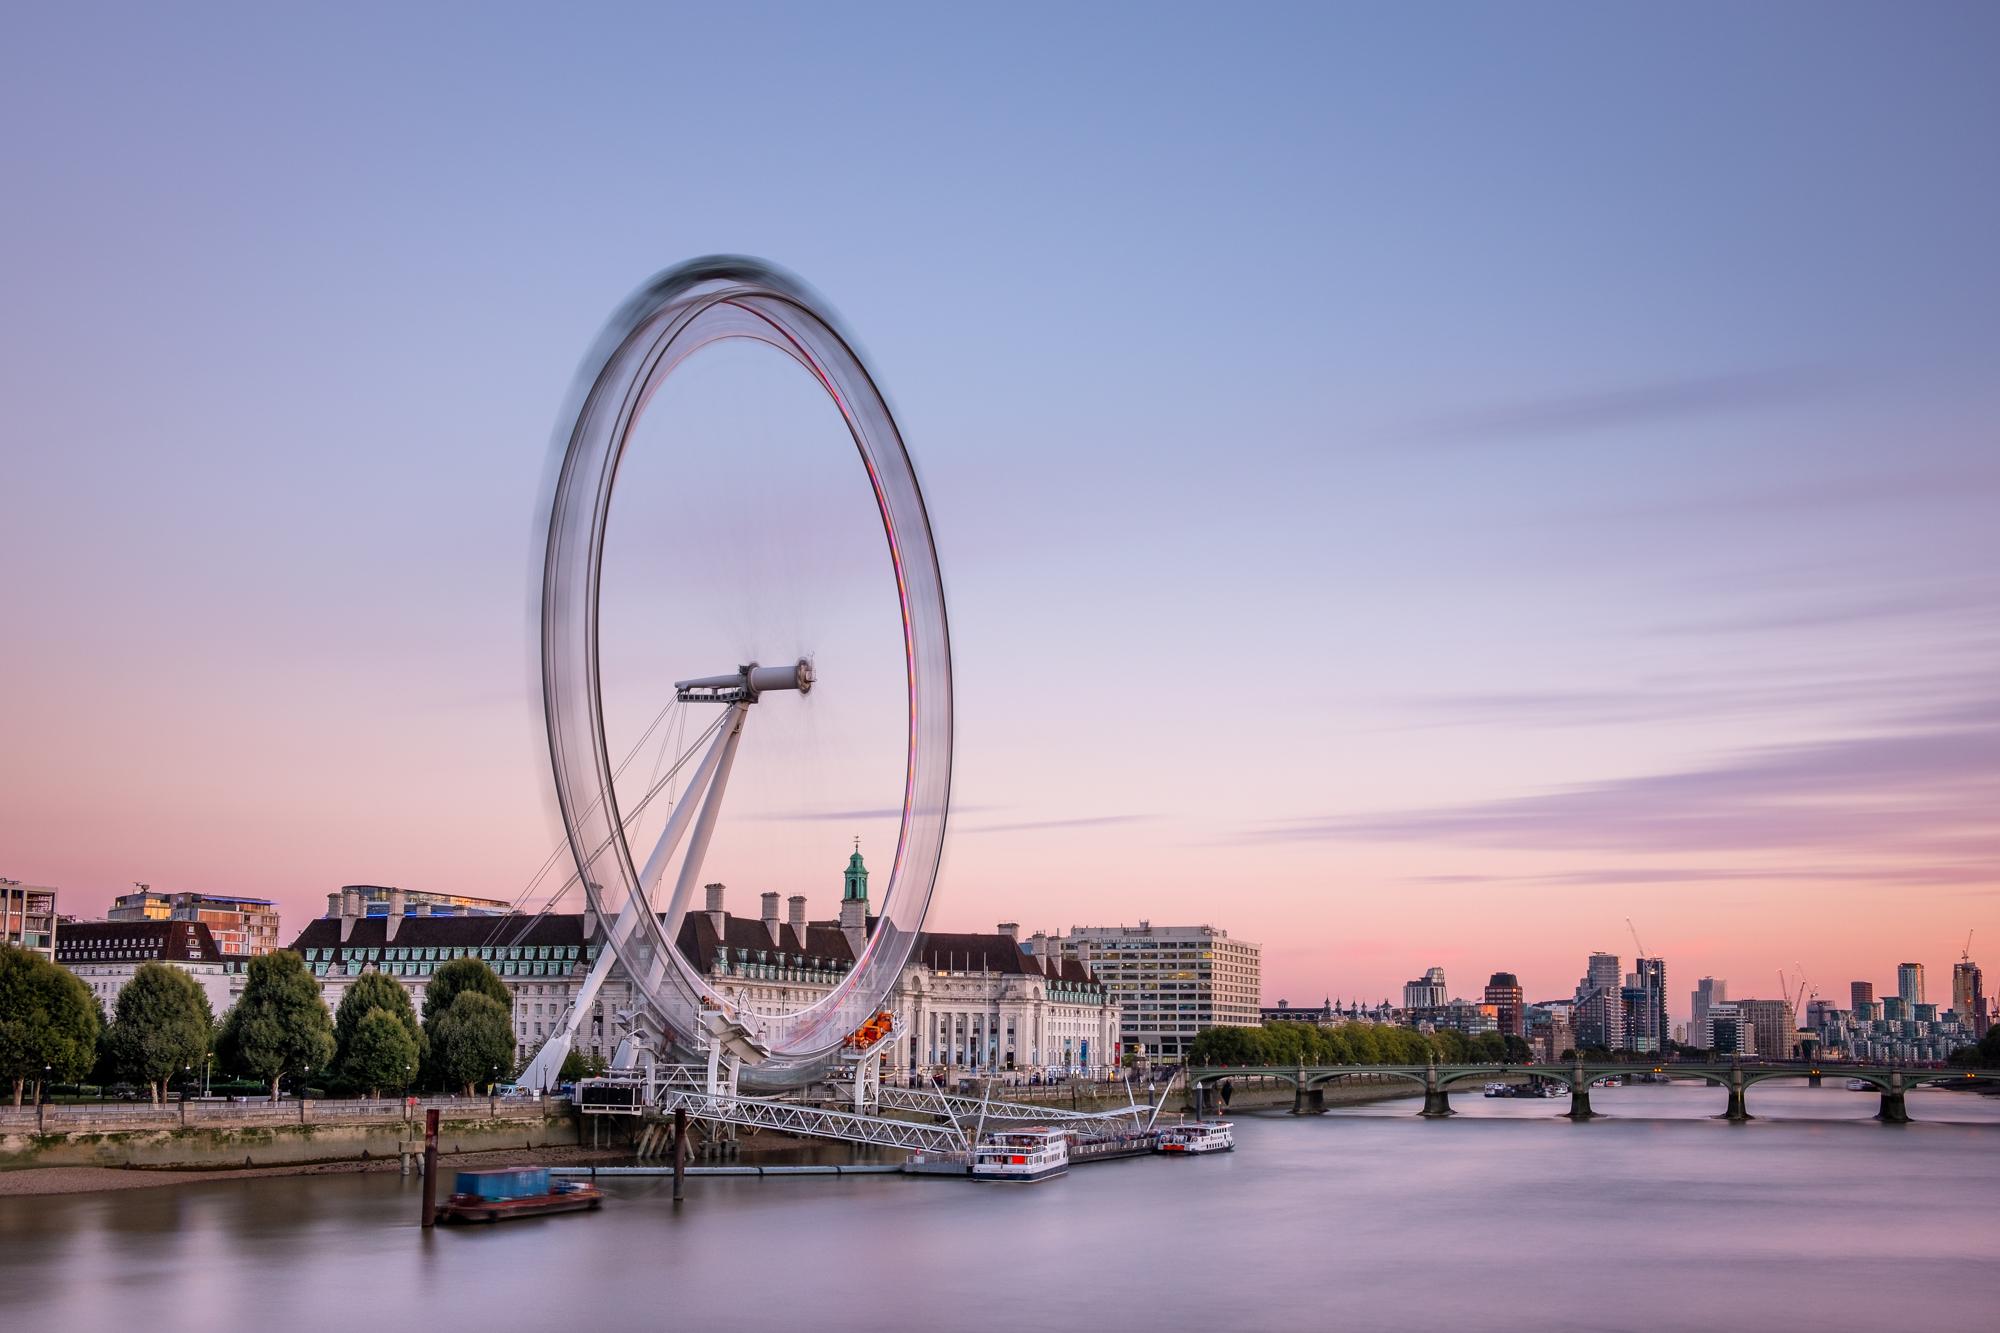 2 Minutes in London | Fujifilm XT2 | XF18-55mm | 24mm | 121 Seconds | f/10 | ISO200